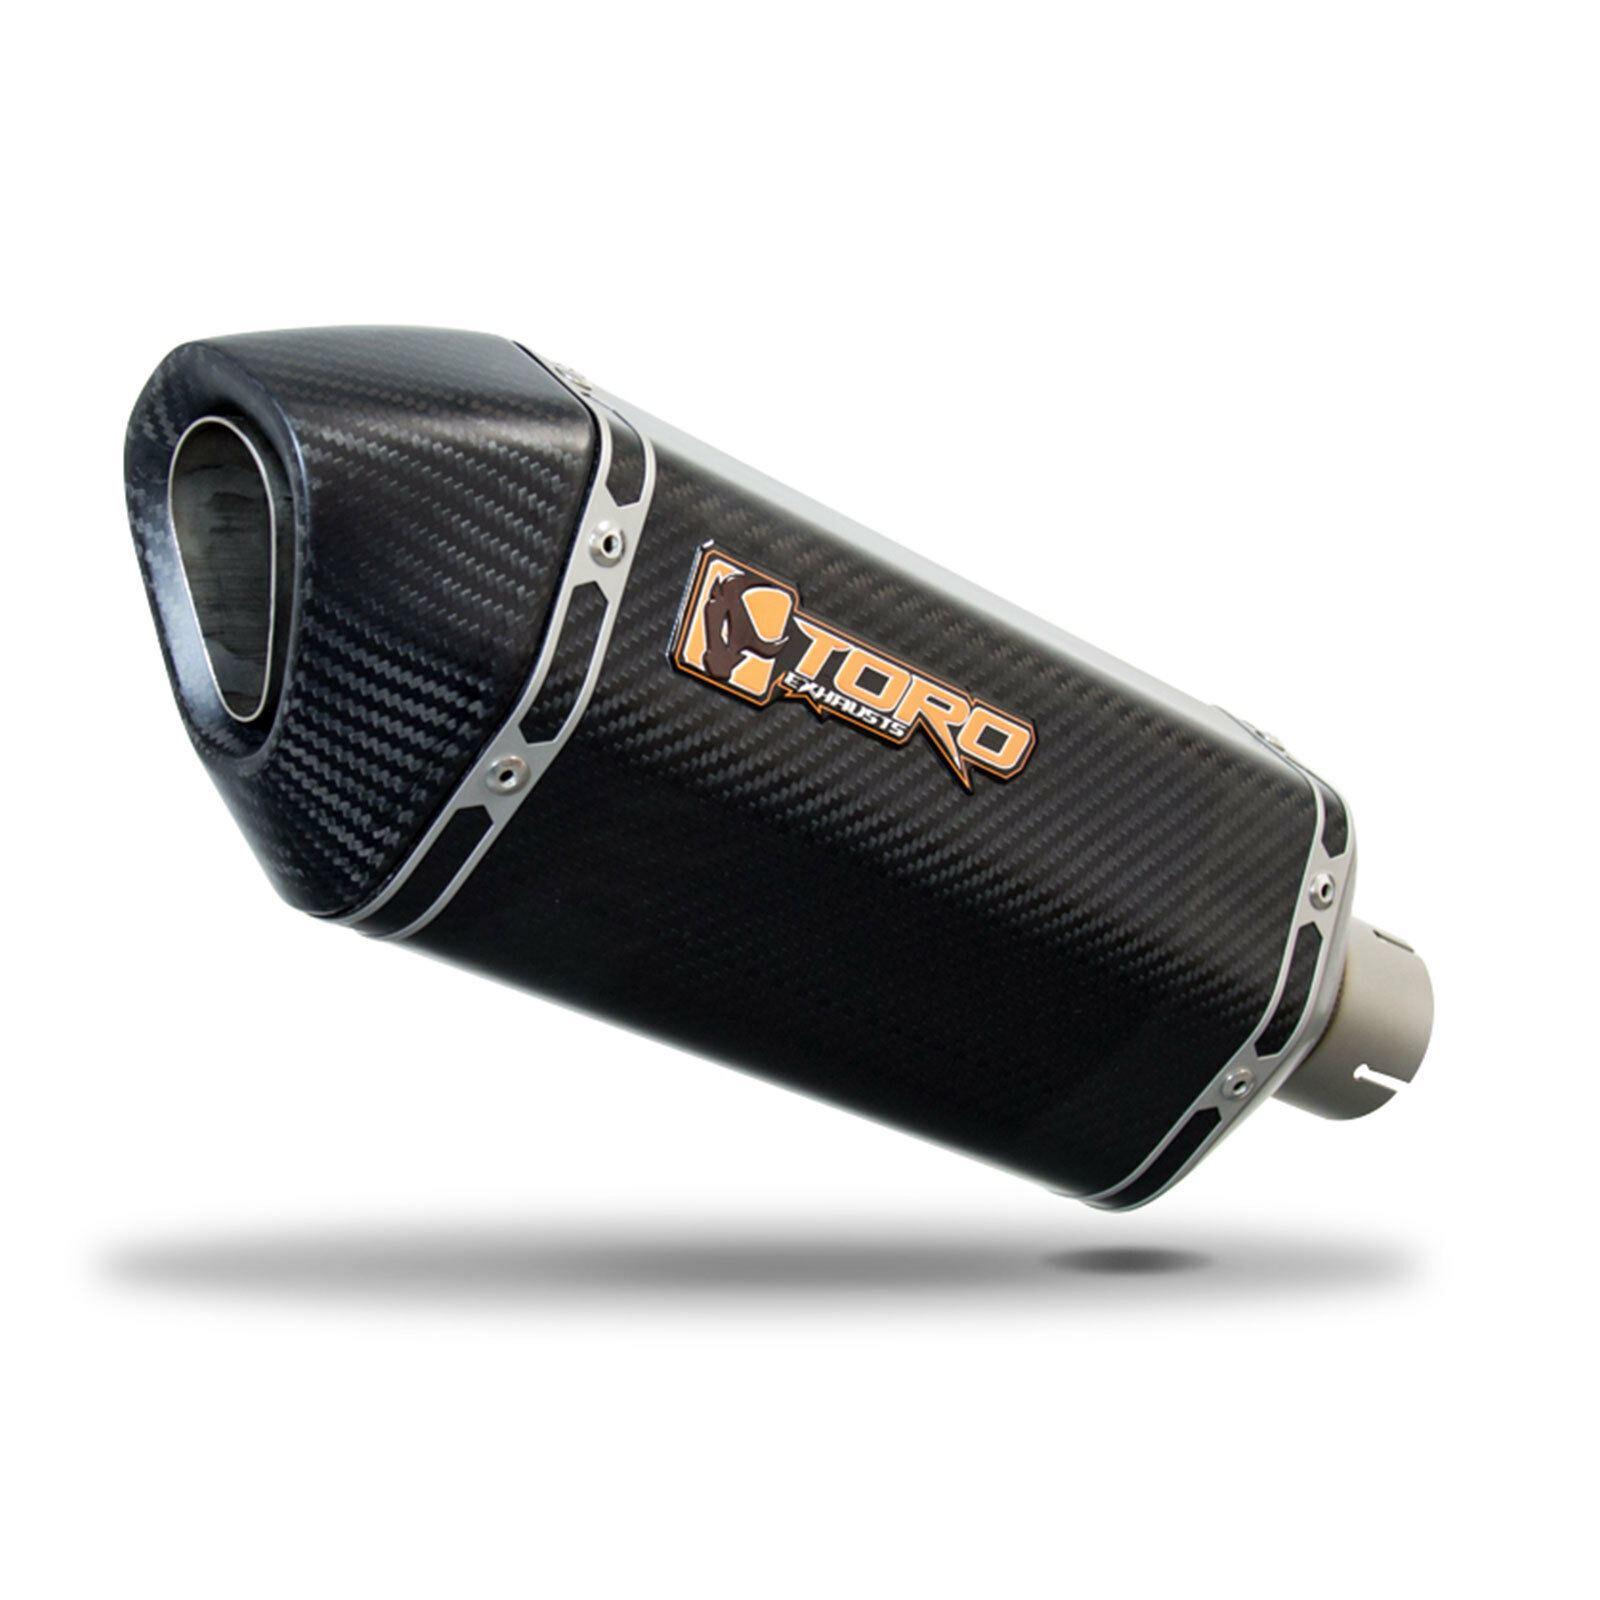 Toro 51mm Universal Slip On Hex Matt Carbon Fibre Motorcycle Exhaust Silencer 5056149000109 Ebay